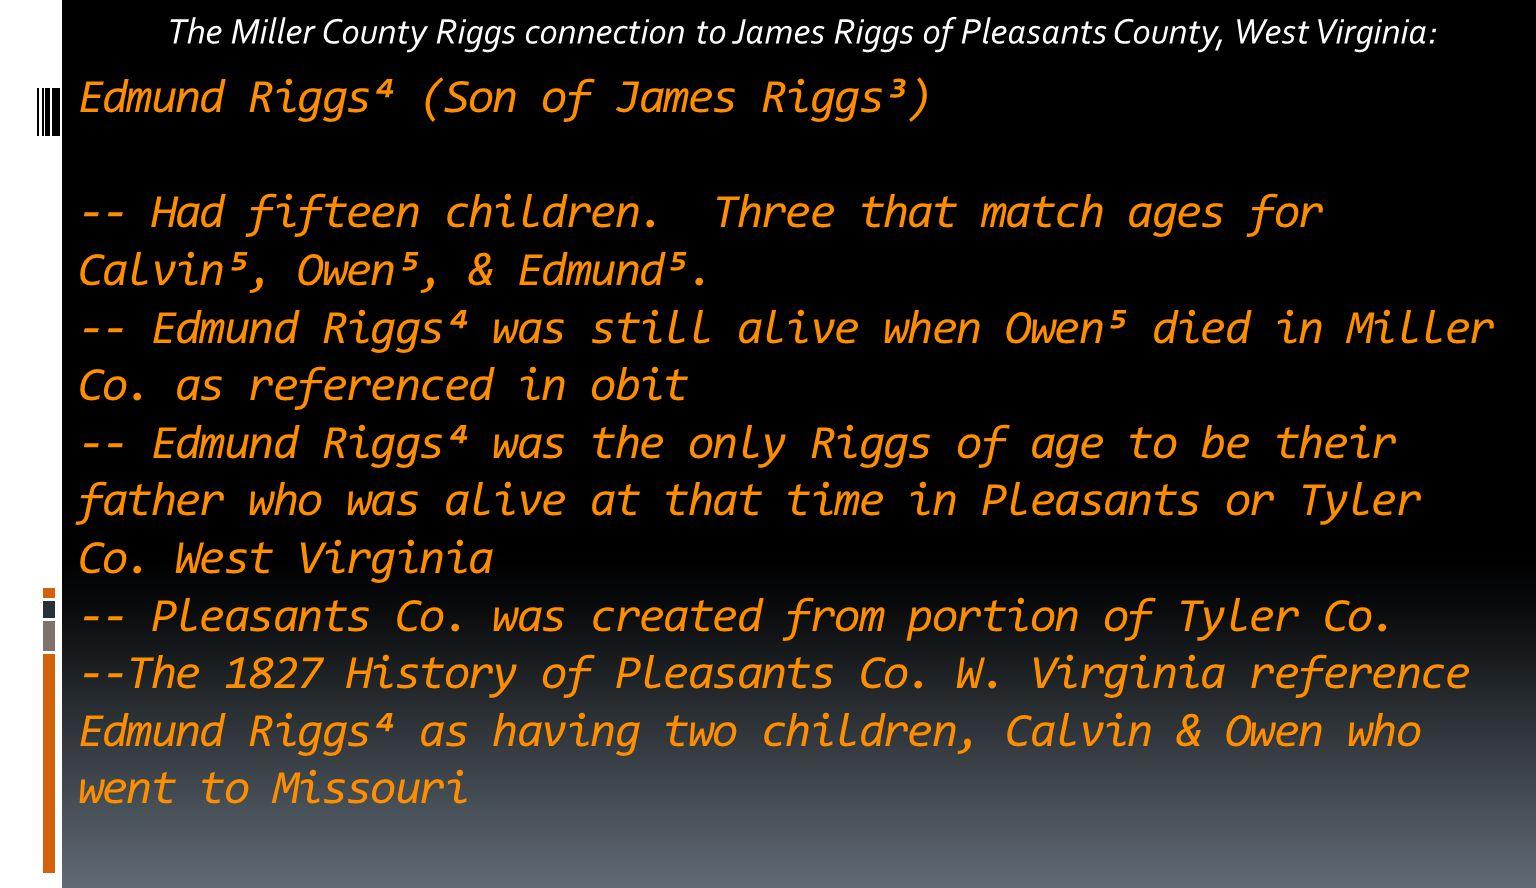 Edmund Riggs⁴ (Son of James Riggs³) -- Had fifteen children.